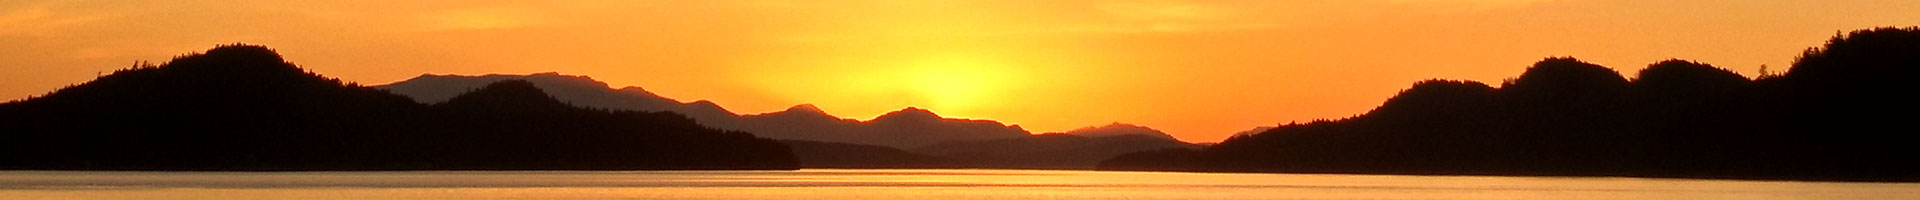 Sunset background image for Web Development Victoria BC